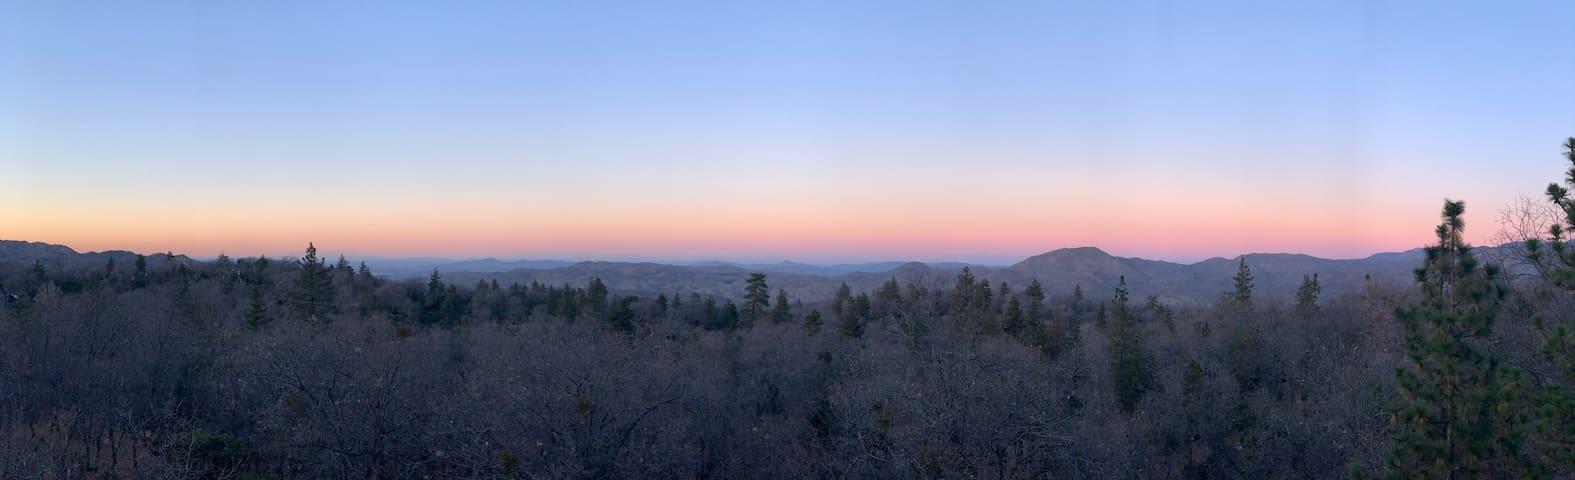 Blue Jay's Vista 5 Bedroom Mountain Retreat